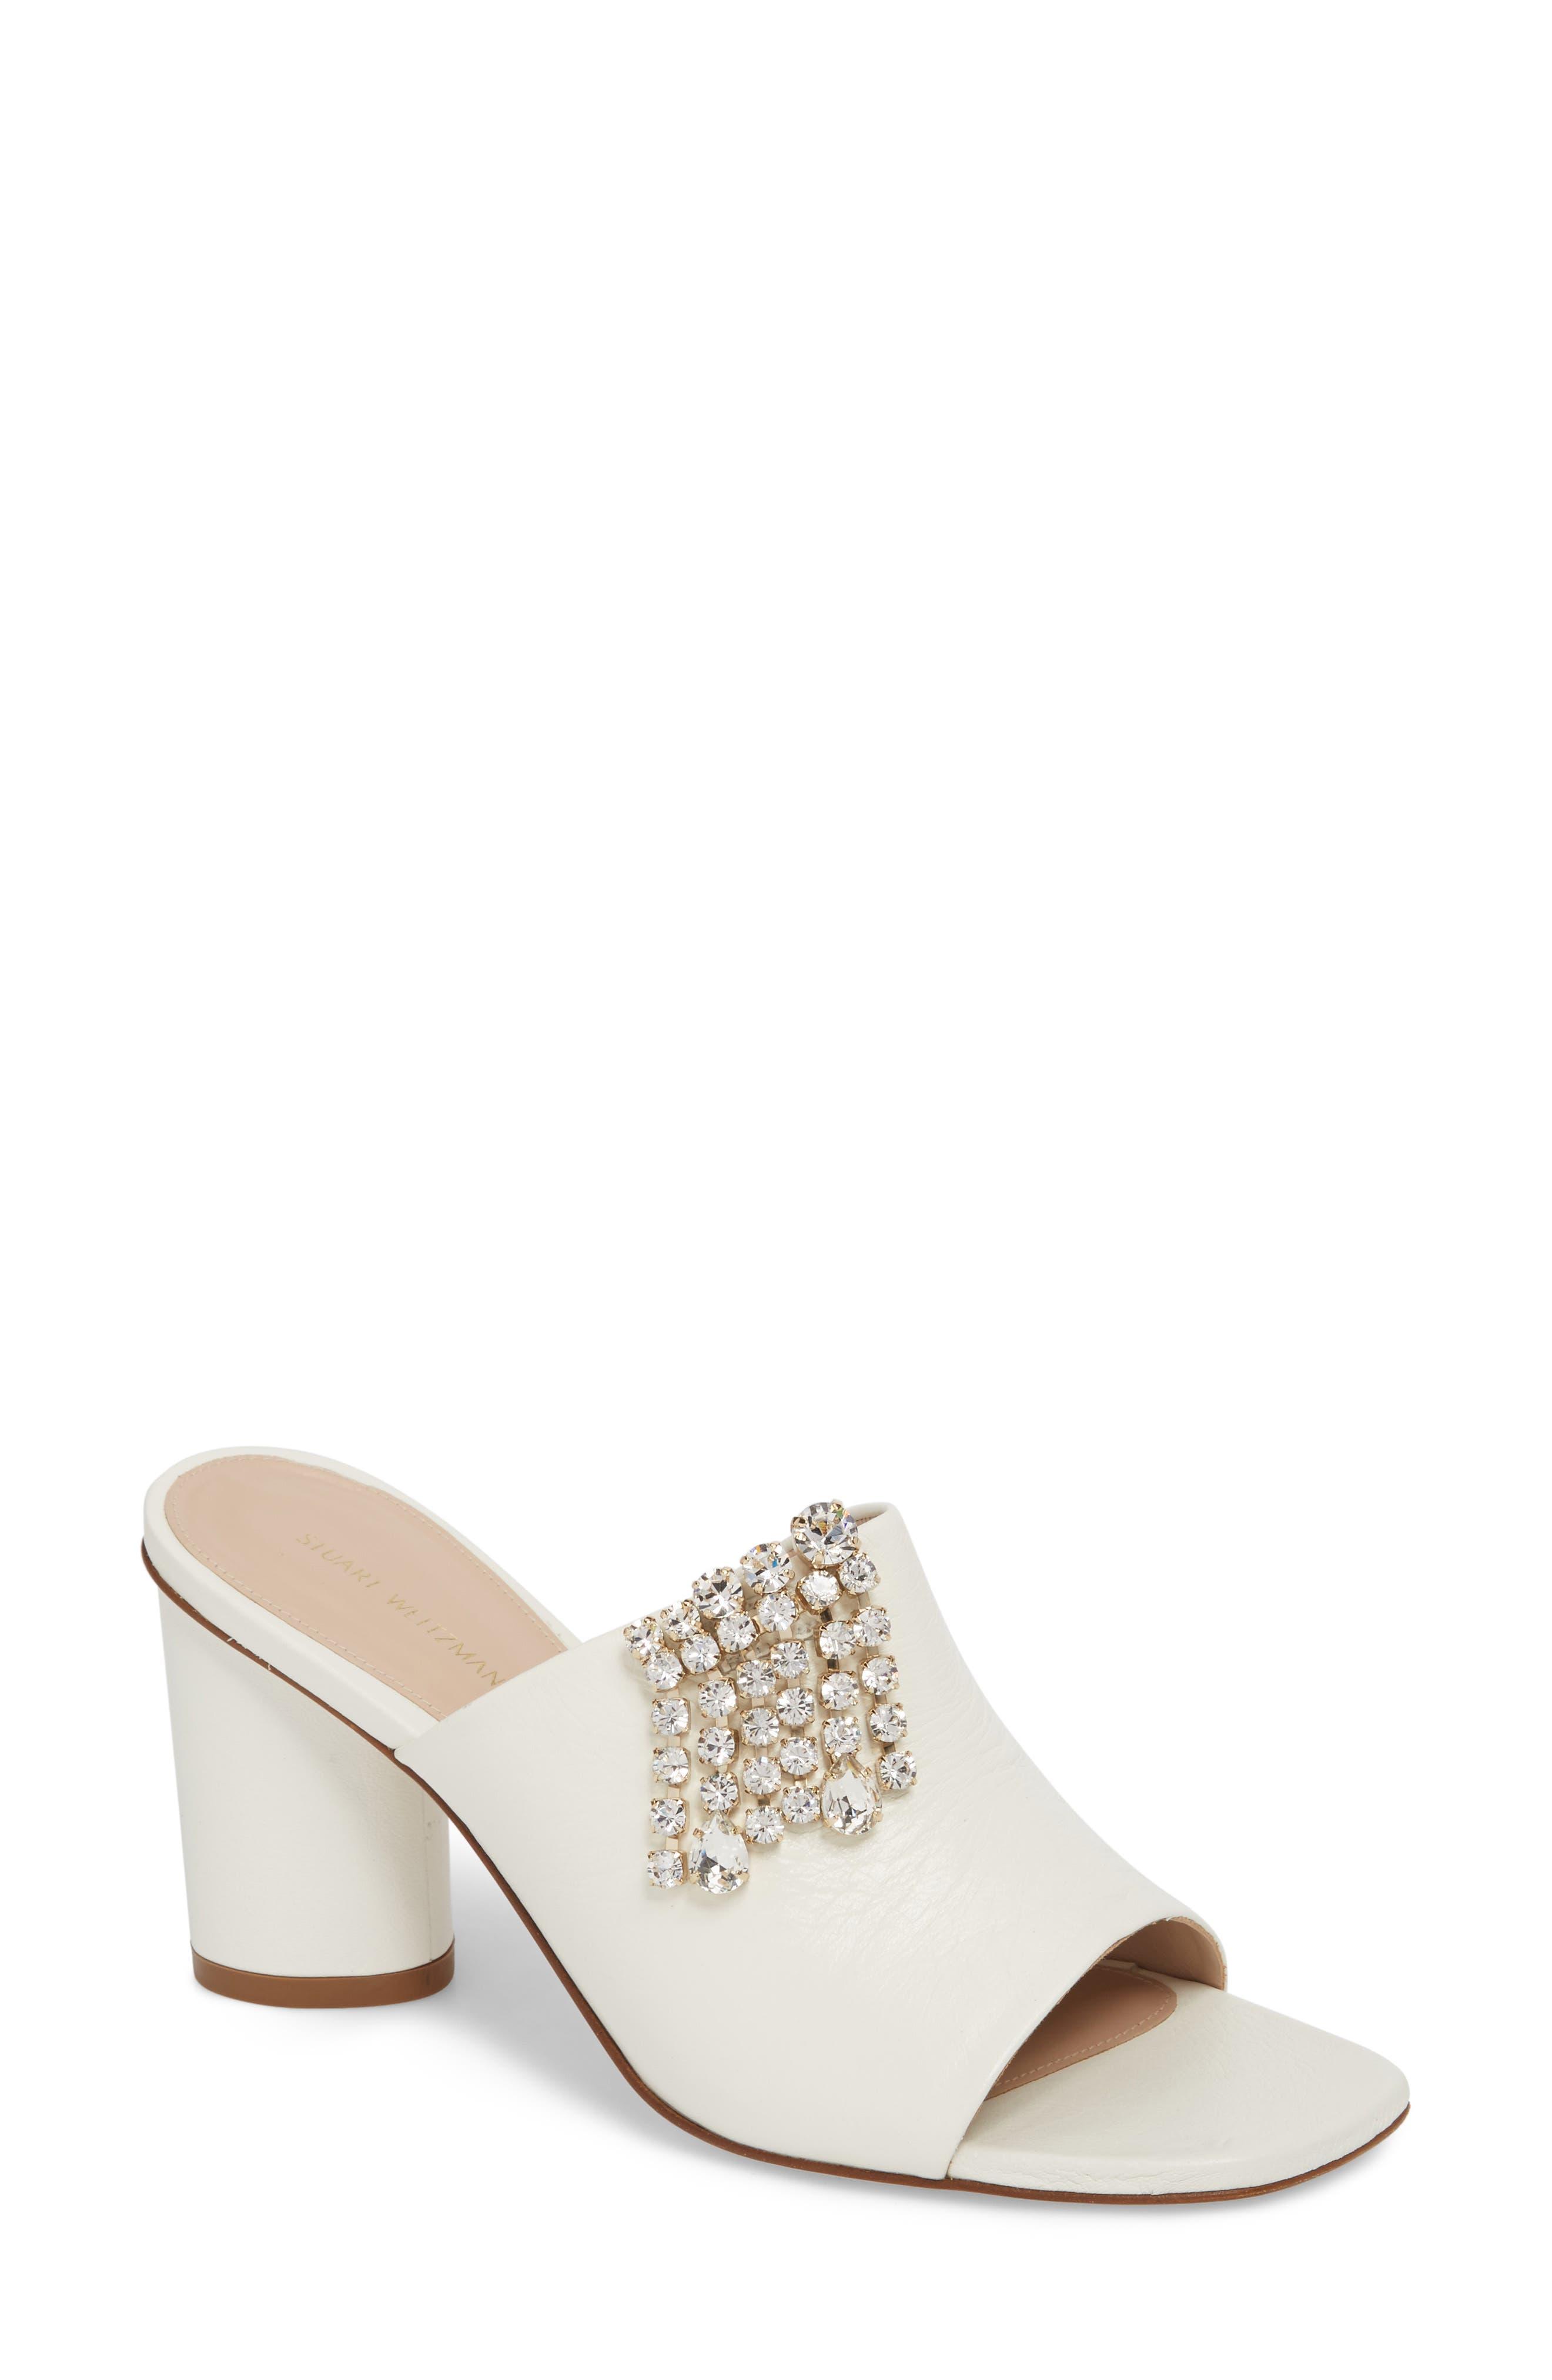 Theone Sandal,                         Main,                         color, White Alpean